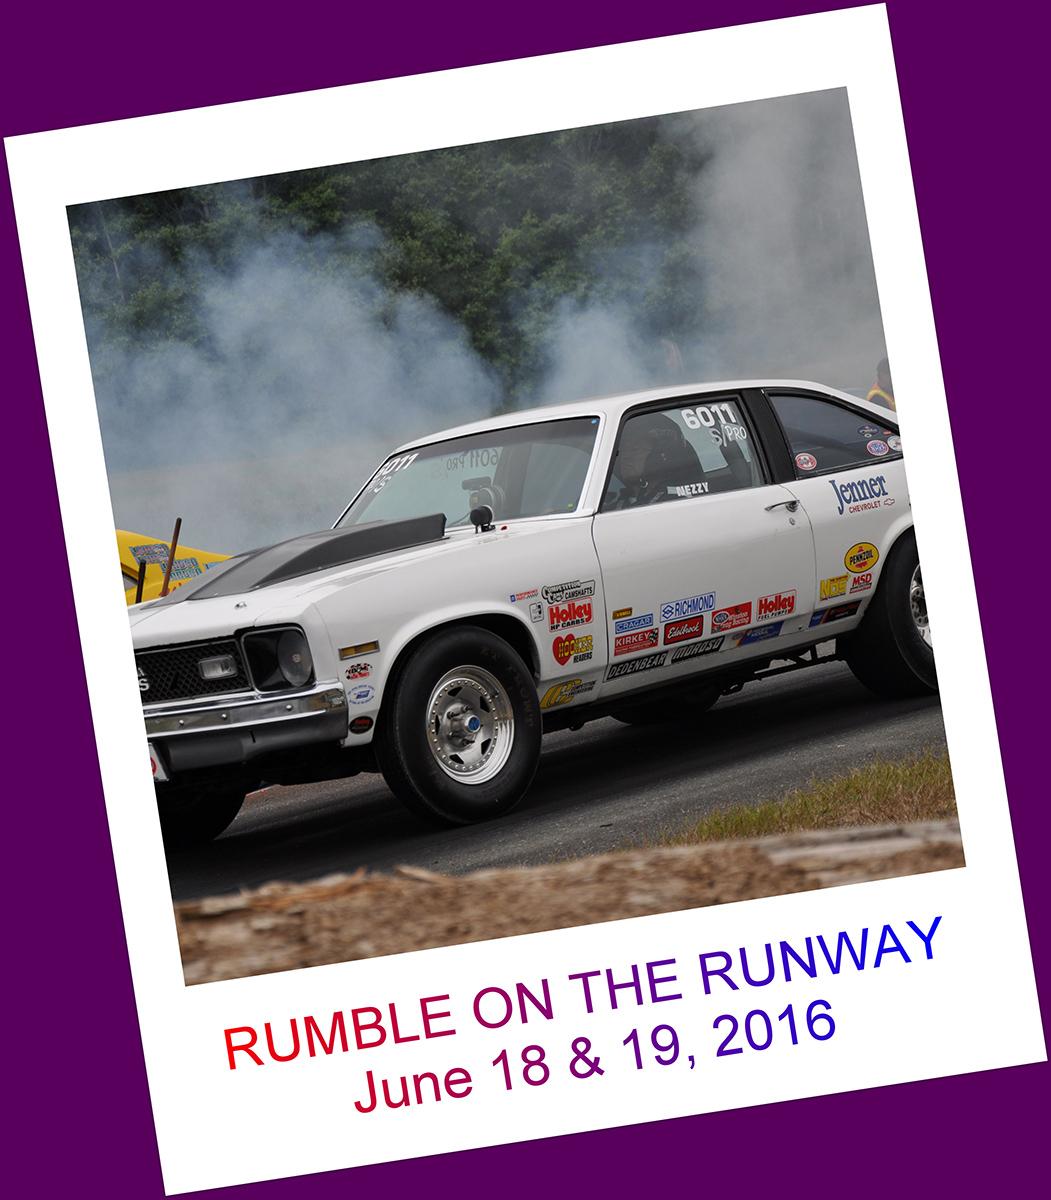 Rumble on the Runway June 18 & 19, 2016 158